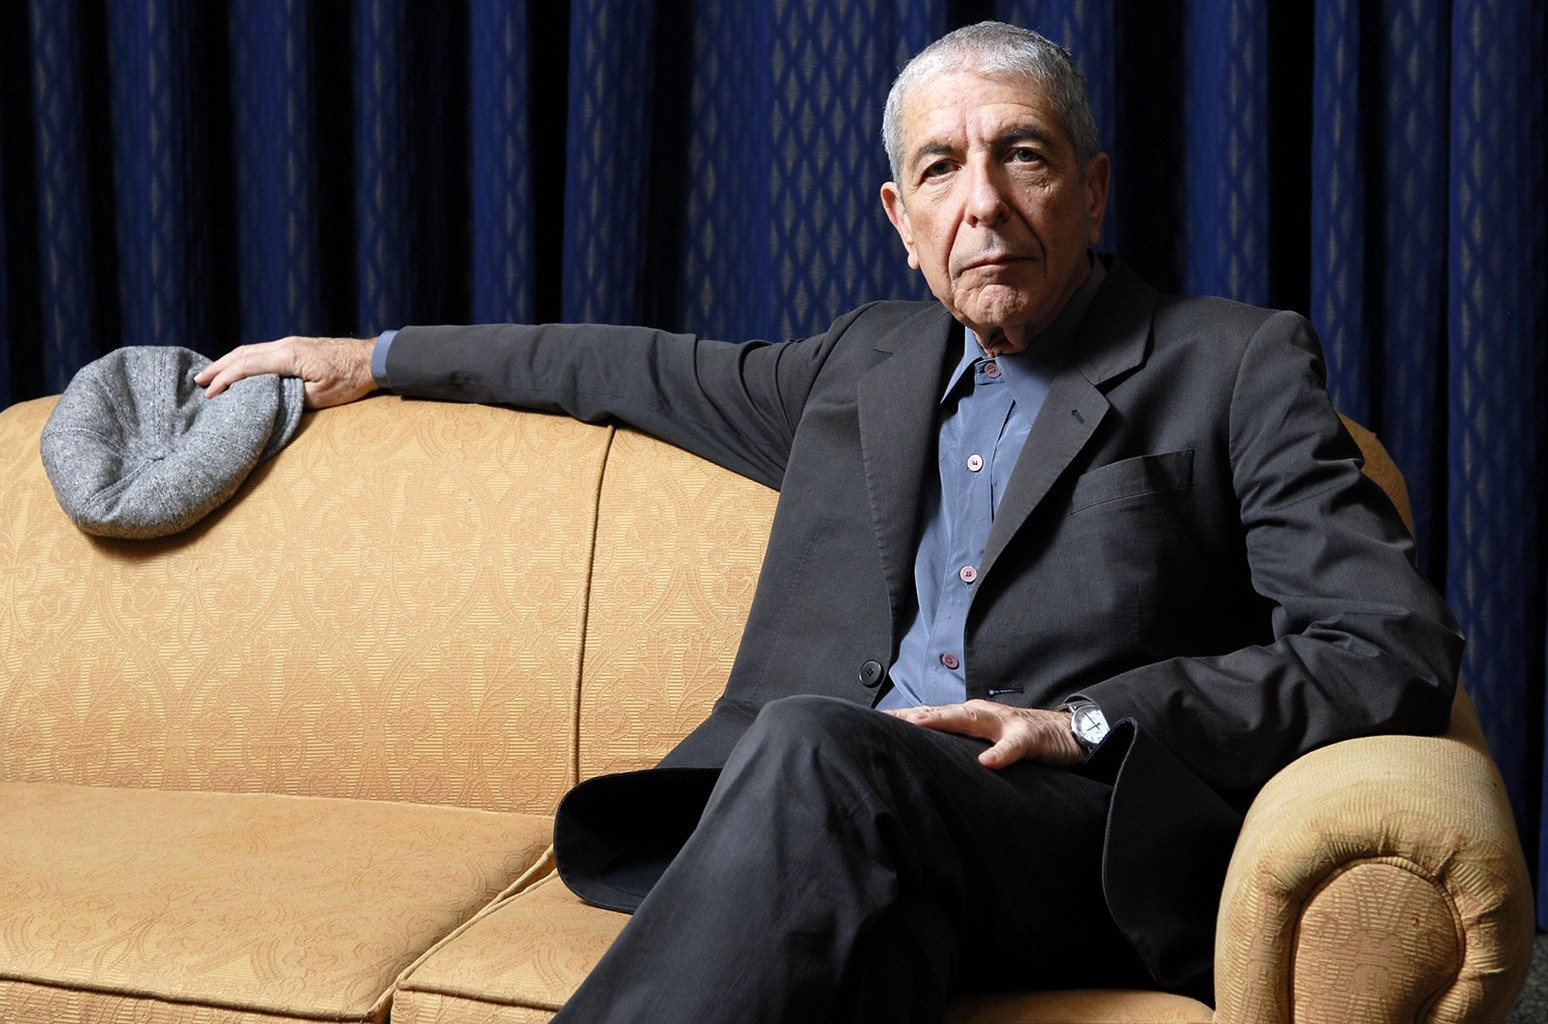 Leonard Cohen photographed in Toronto